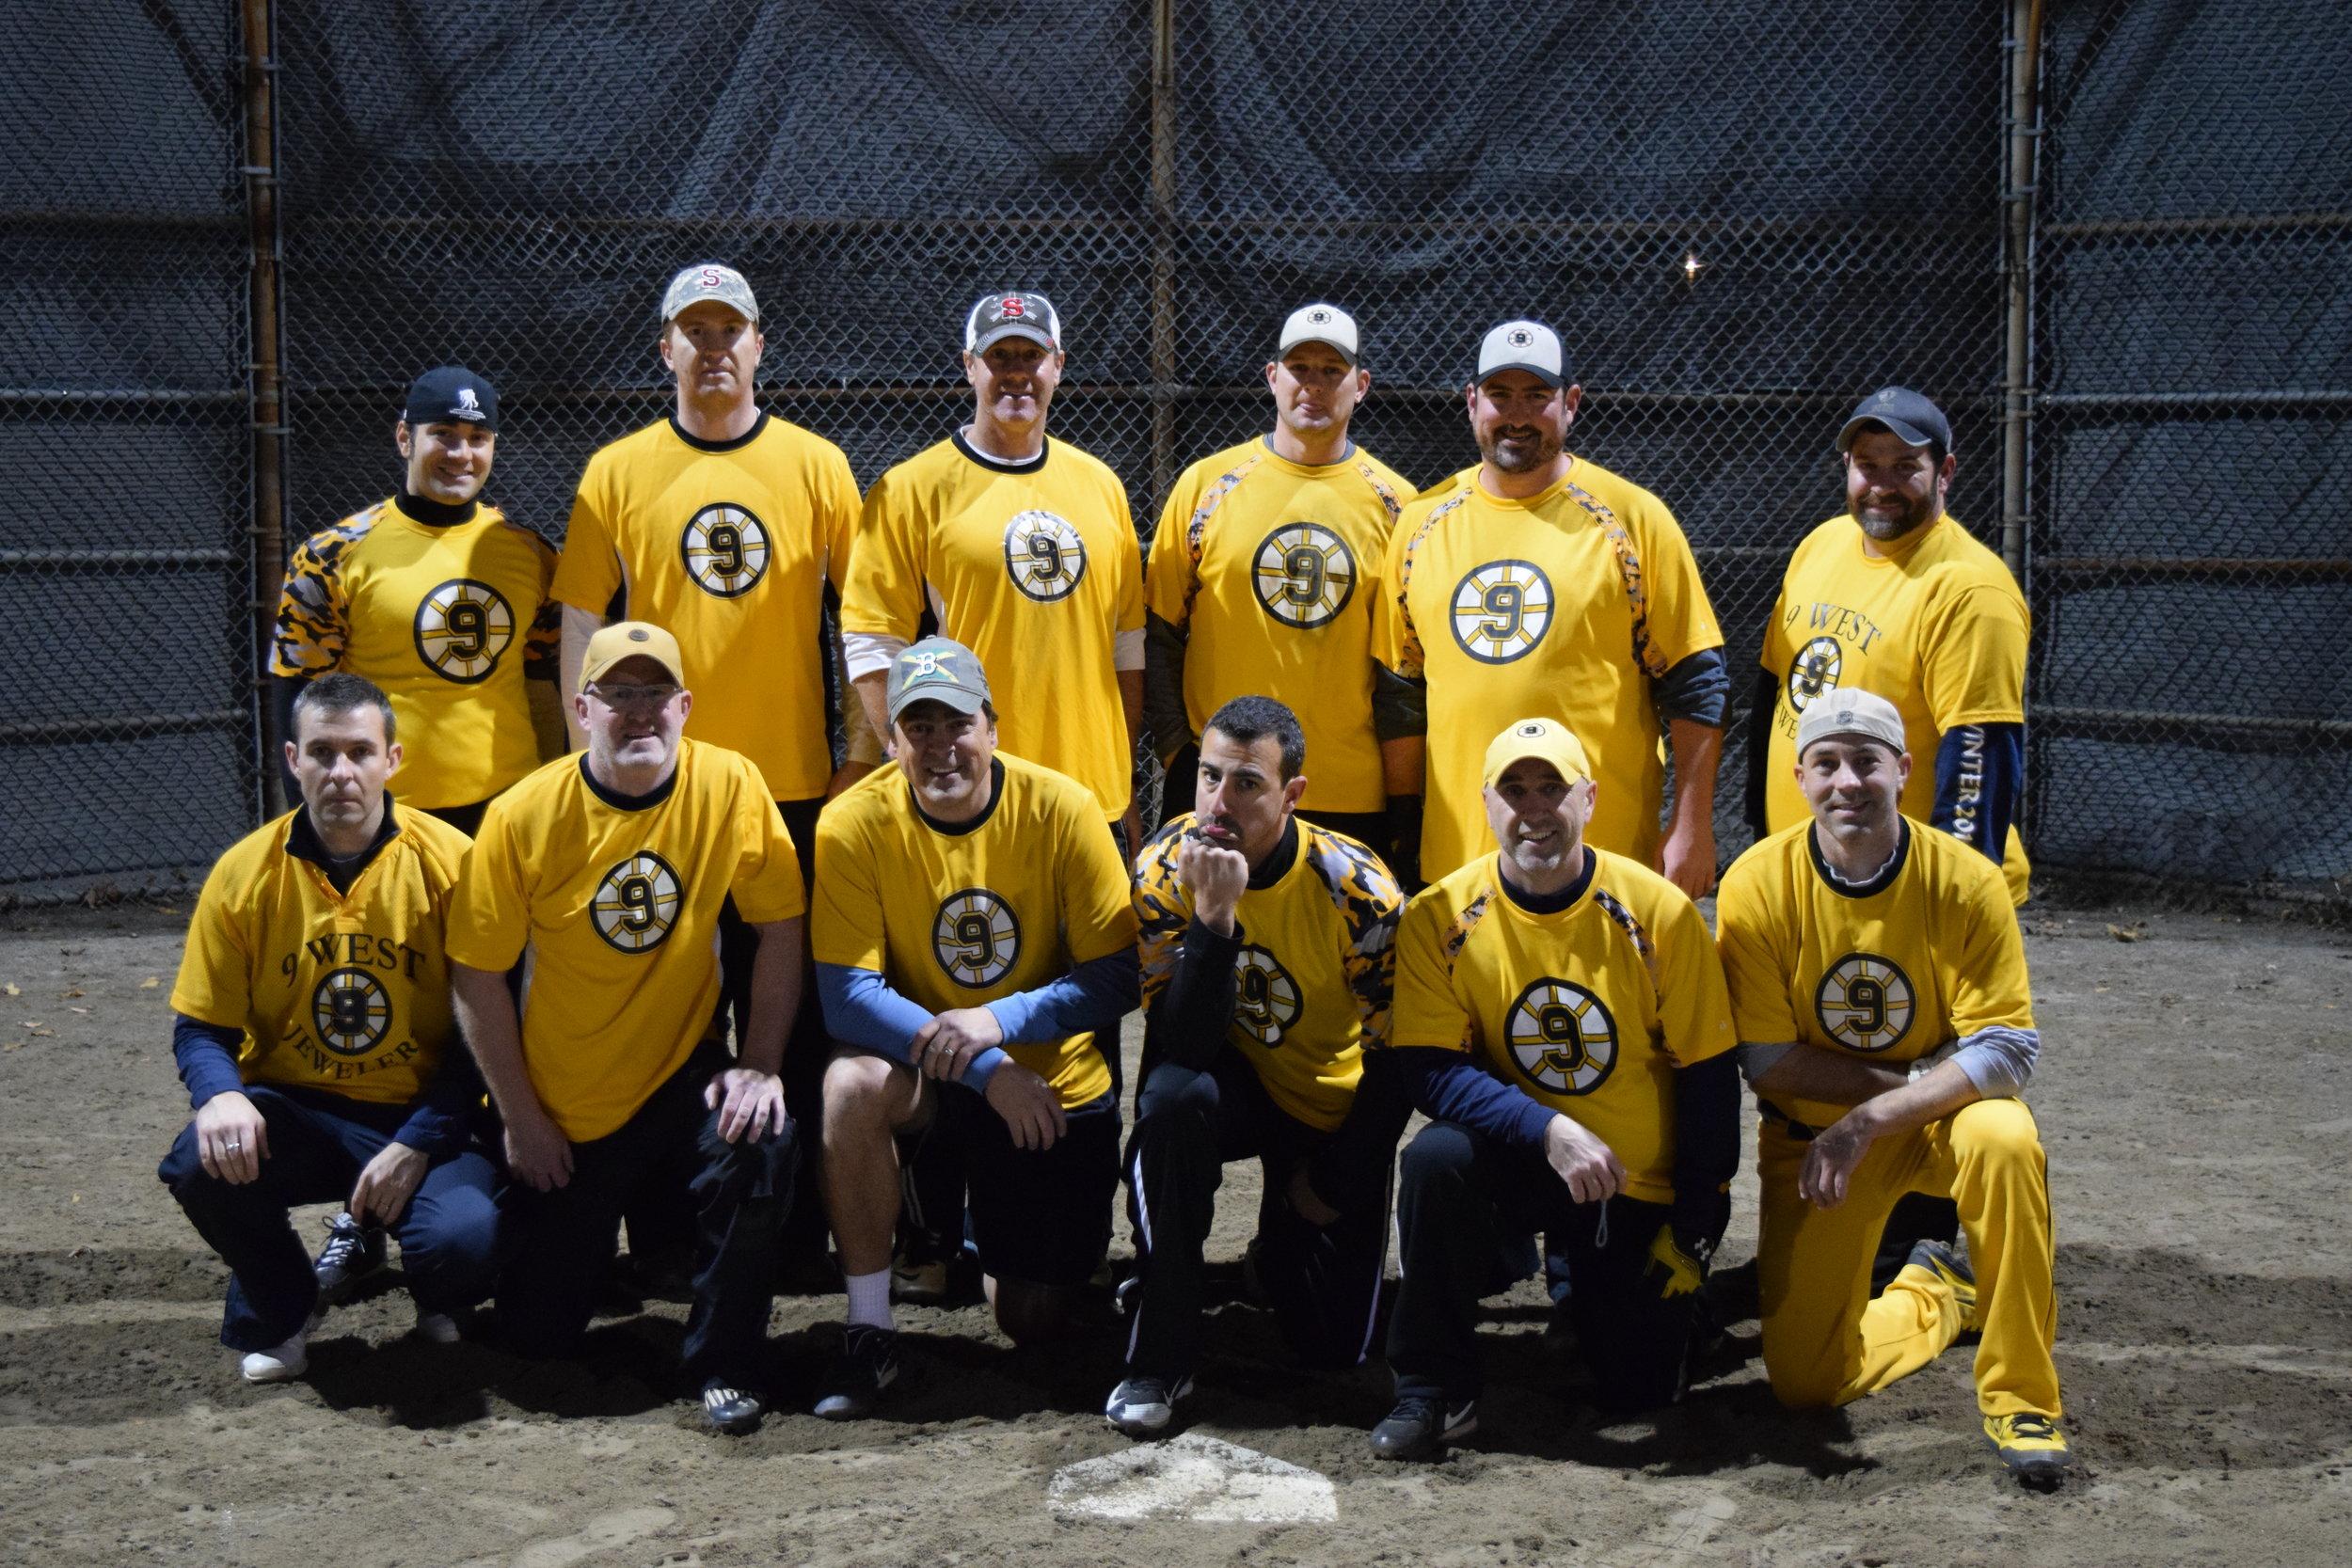 The Yellow Team - Runner-ups for the 2016 Fall Wayland Men's Softball Season